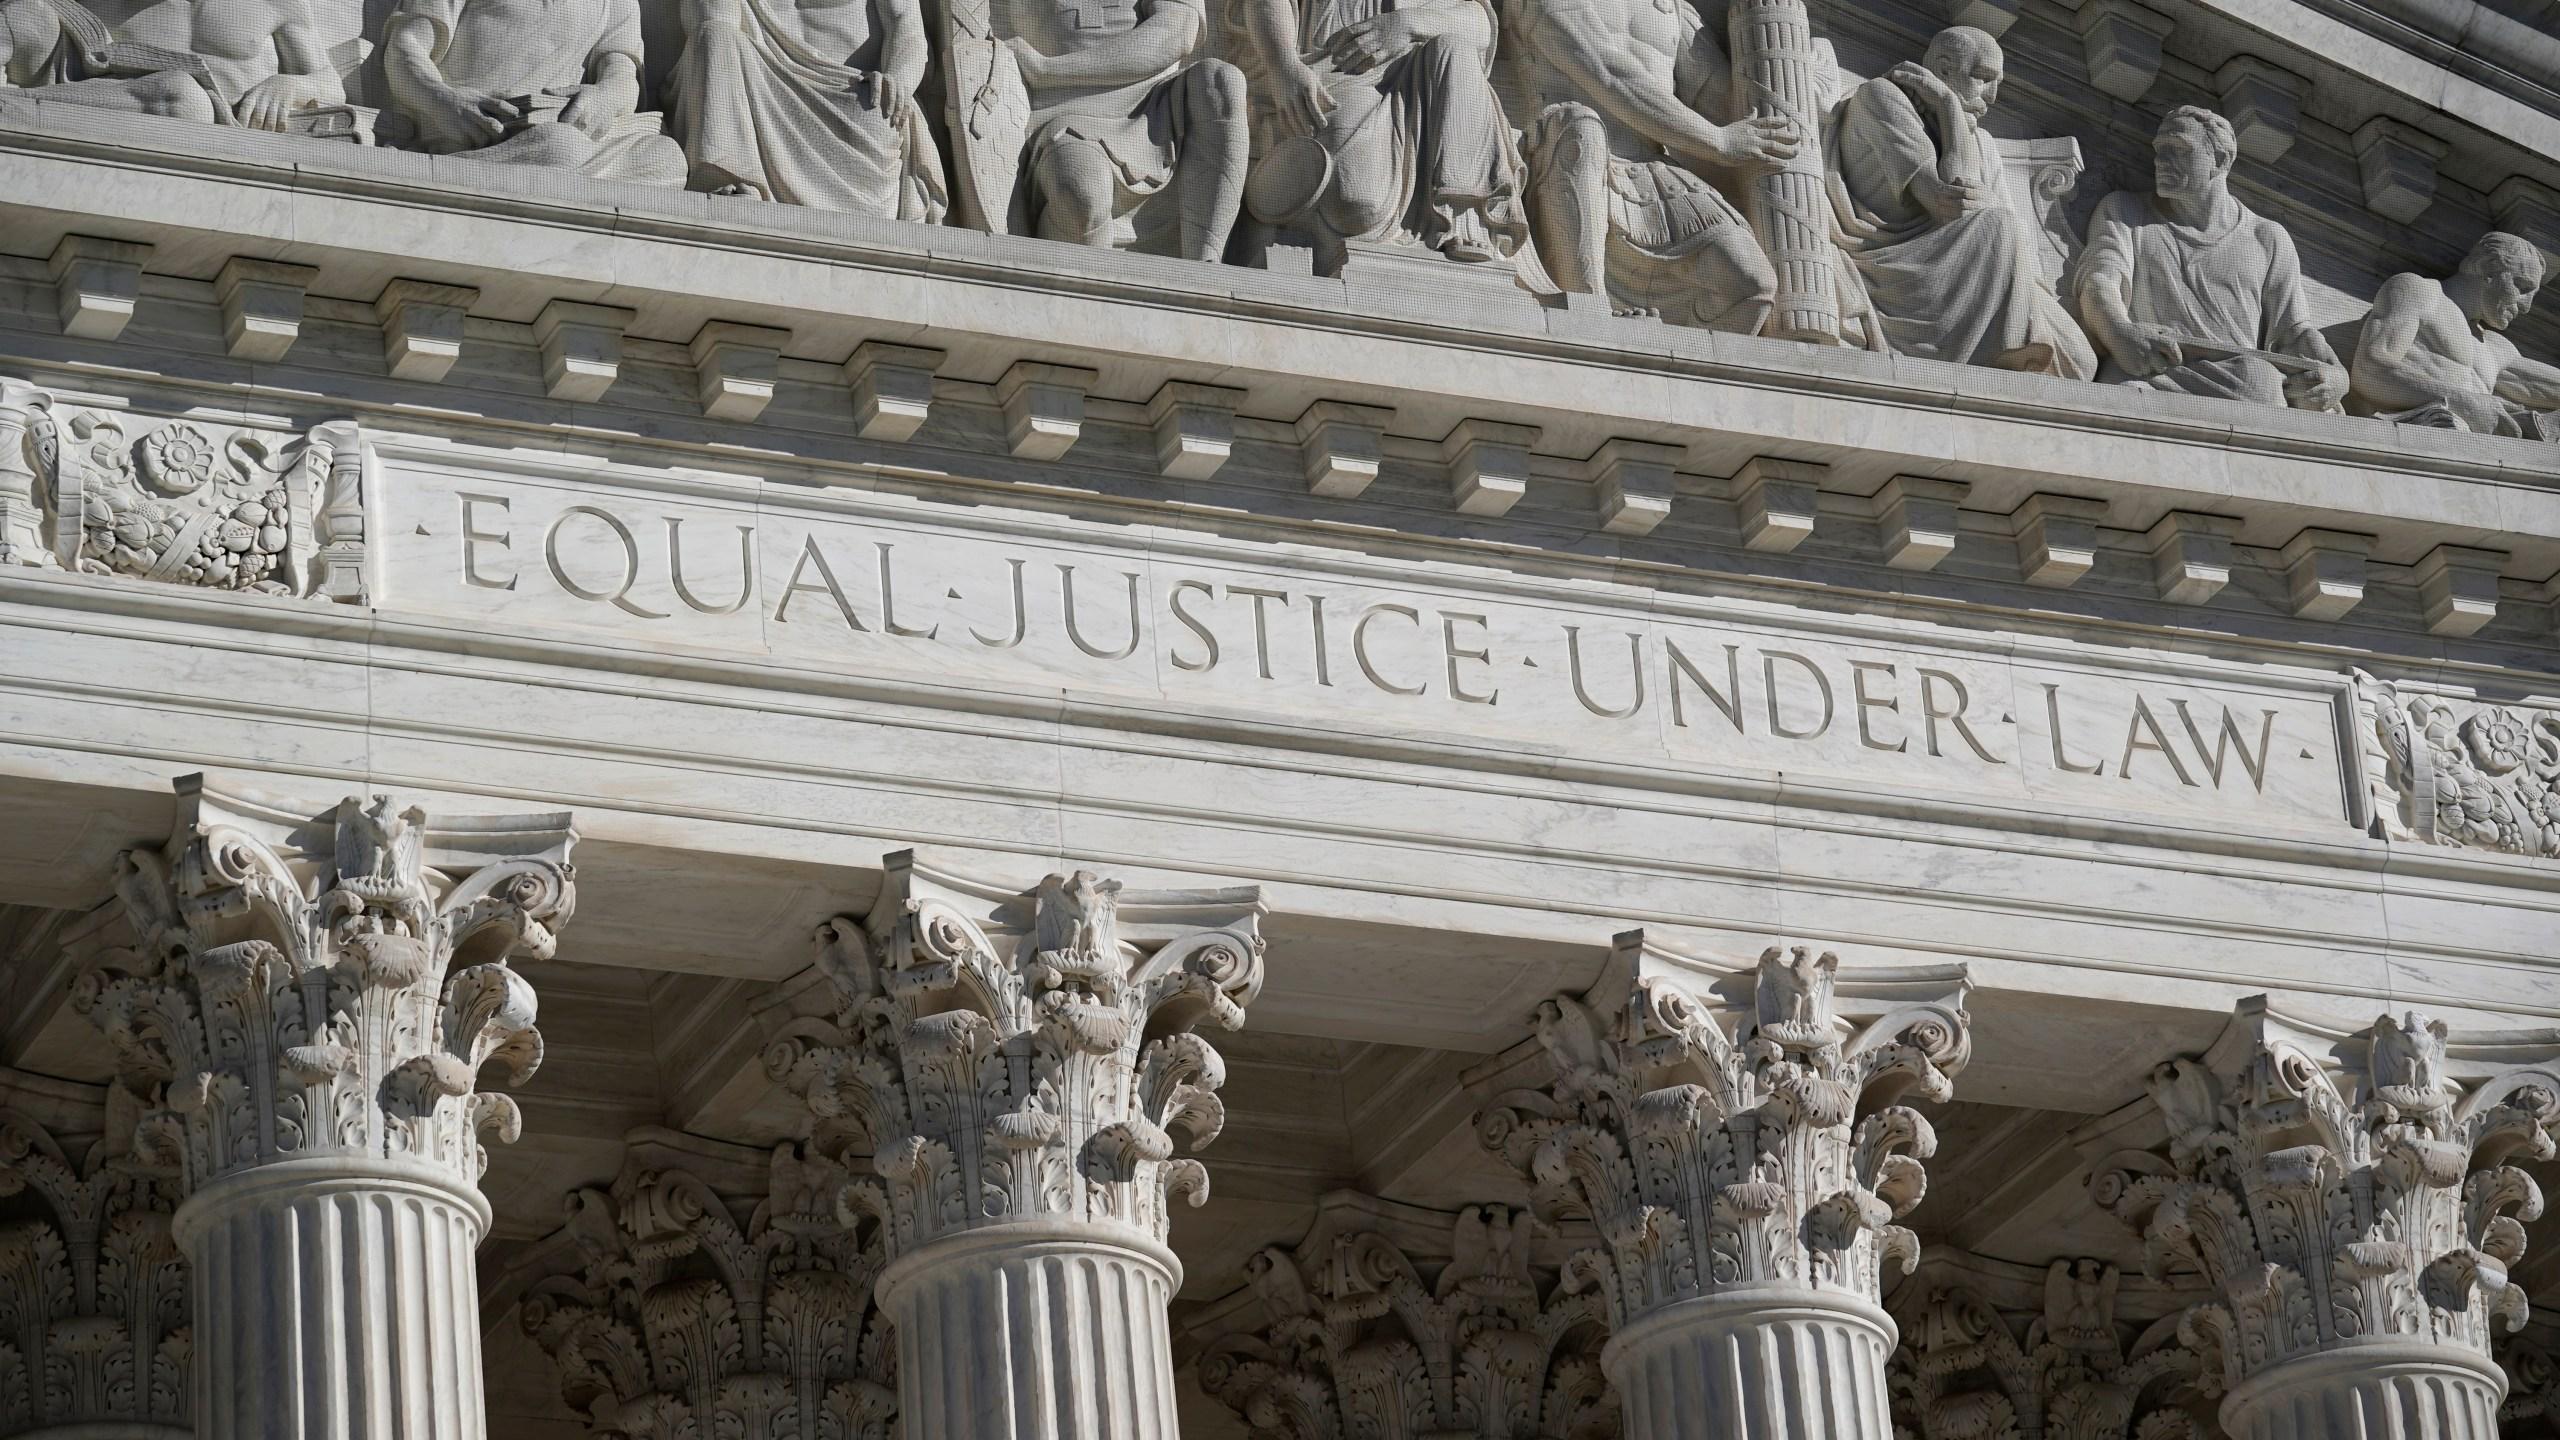 In this Nov. 4, 2020 file photo, the Supreme Court is seen in Washington. (AP Photo/J. Scott Applewhite, File)